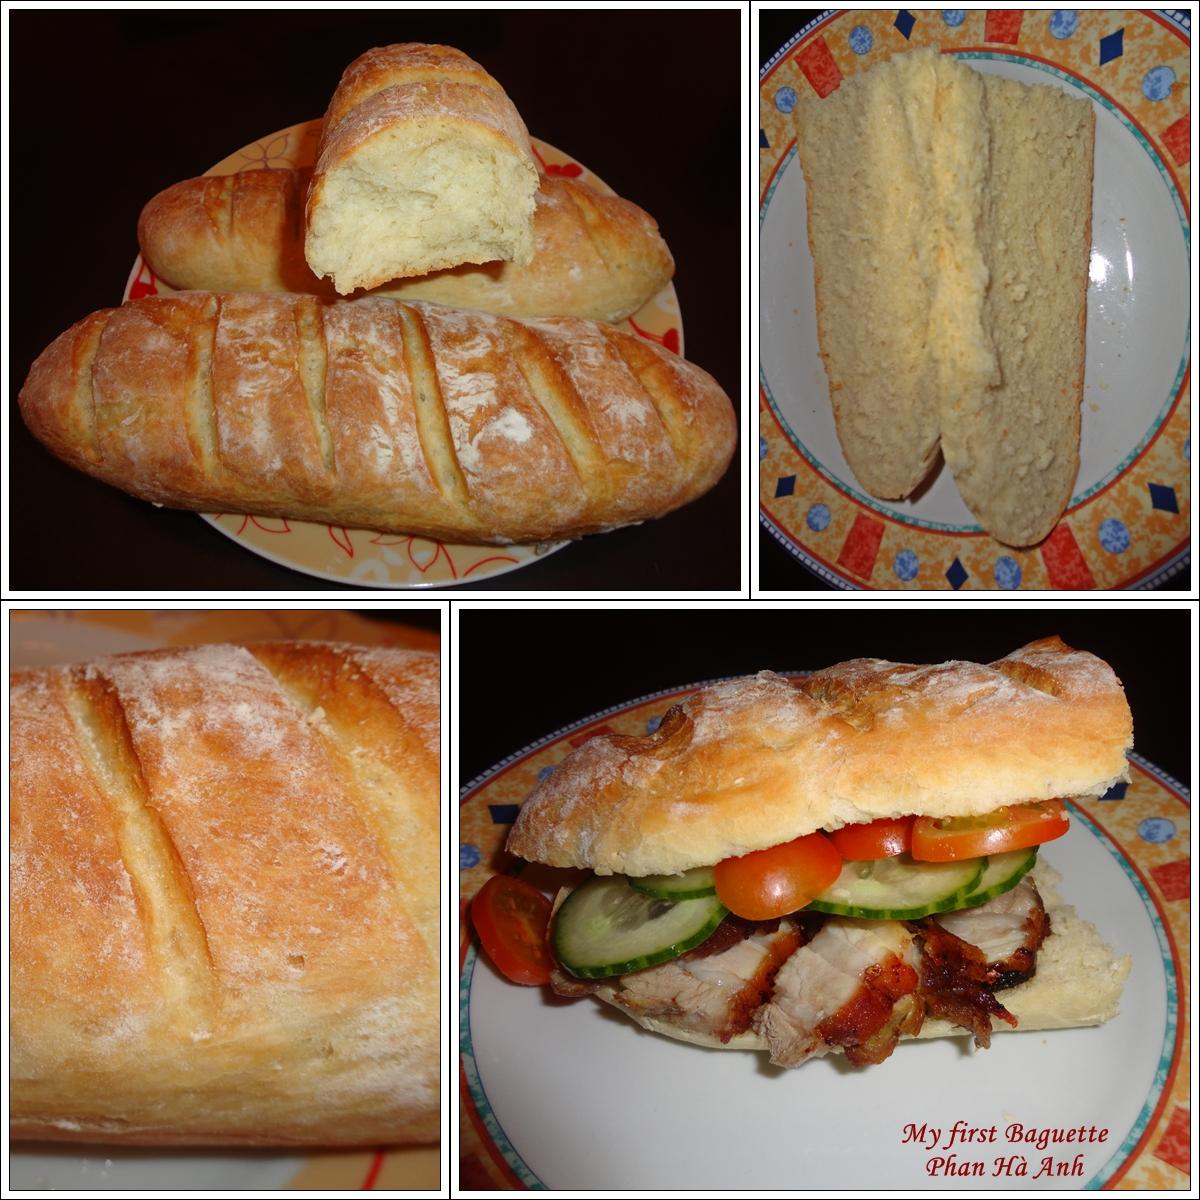 banh-mi-baguette 4